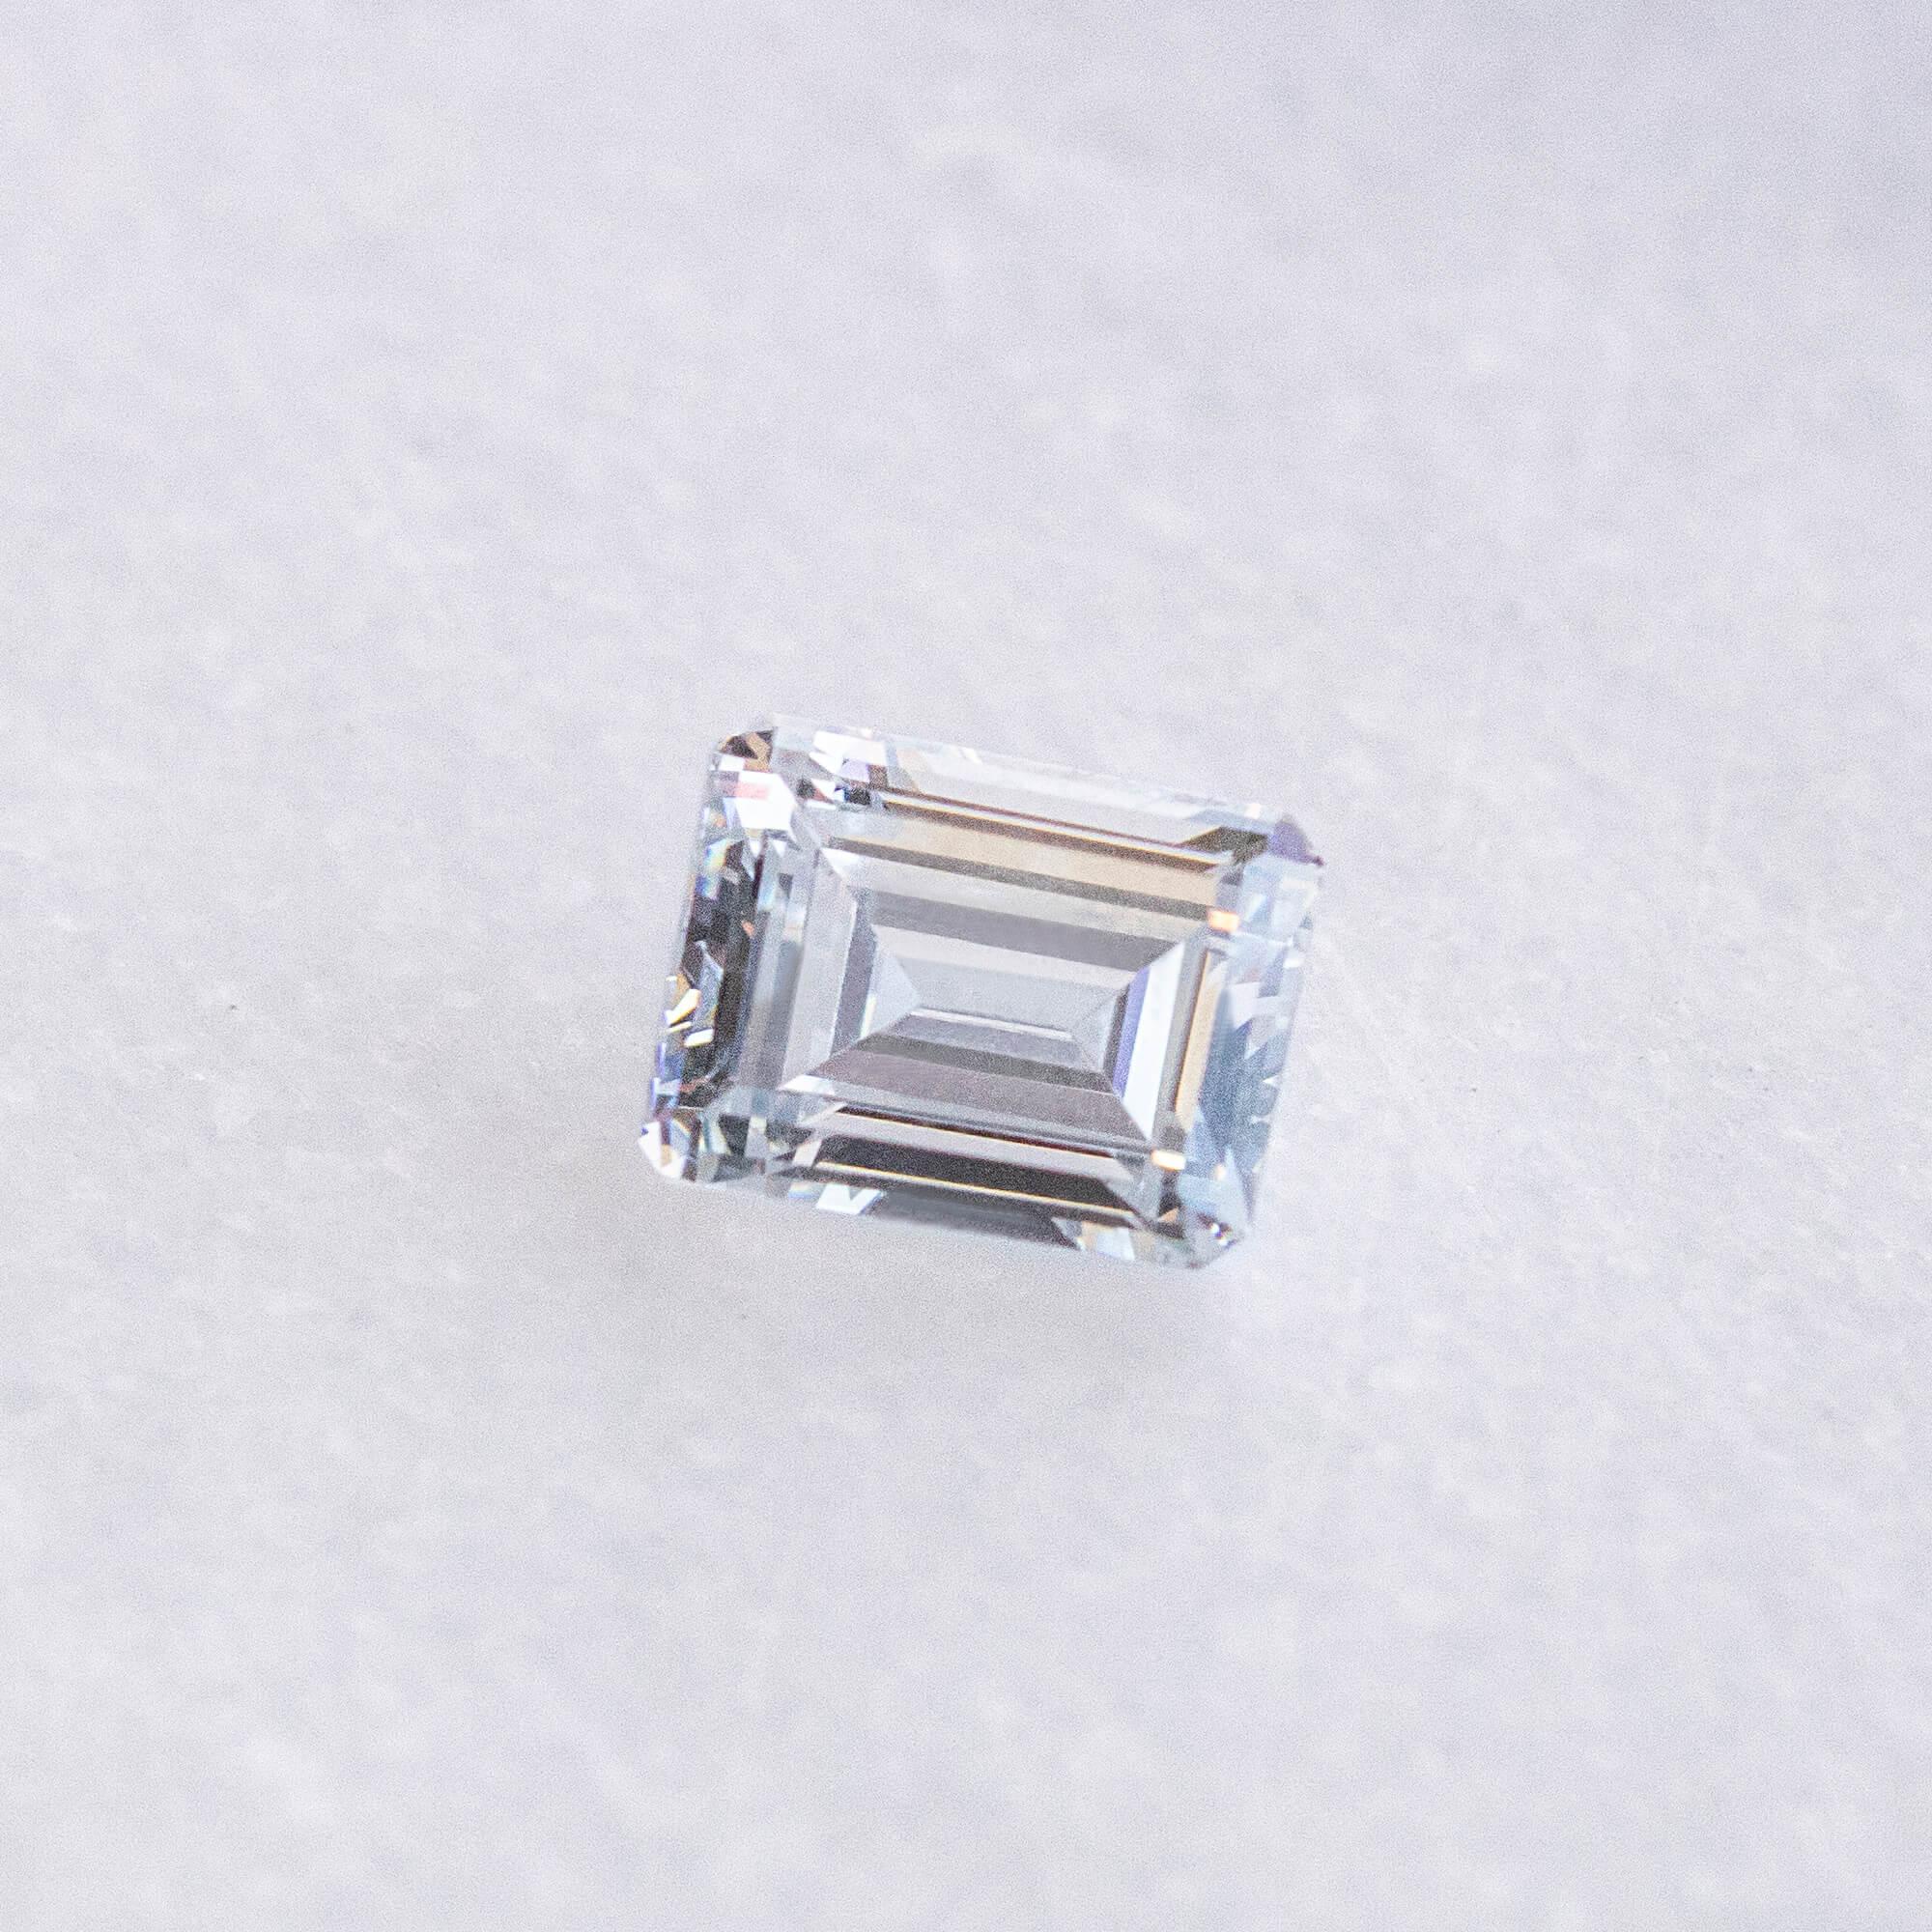 An Emerald Nexus Diamond alternative.